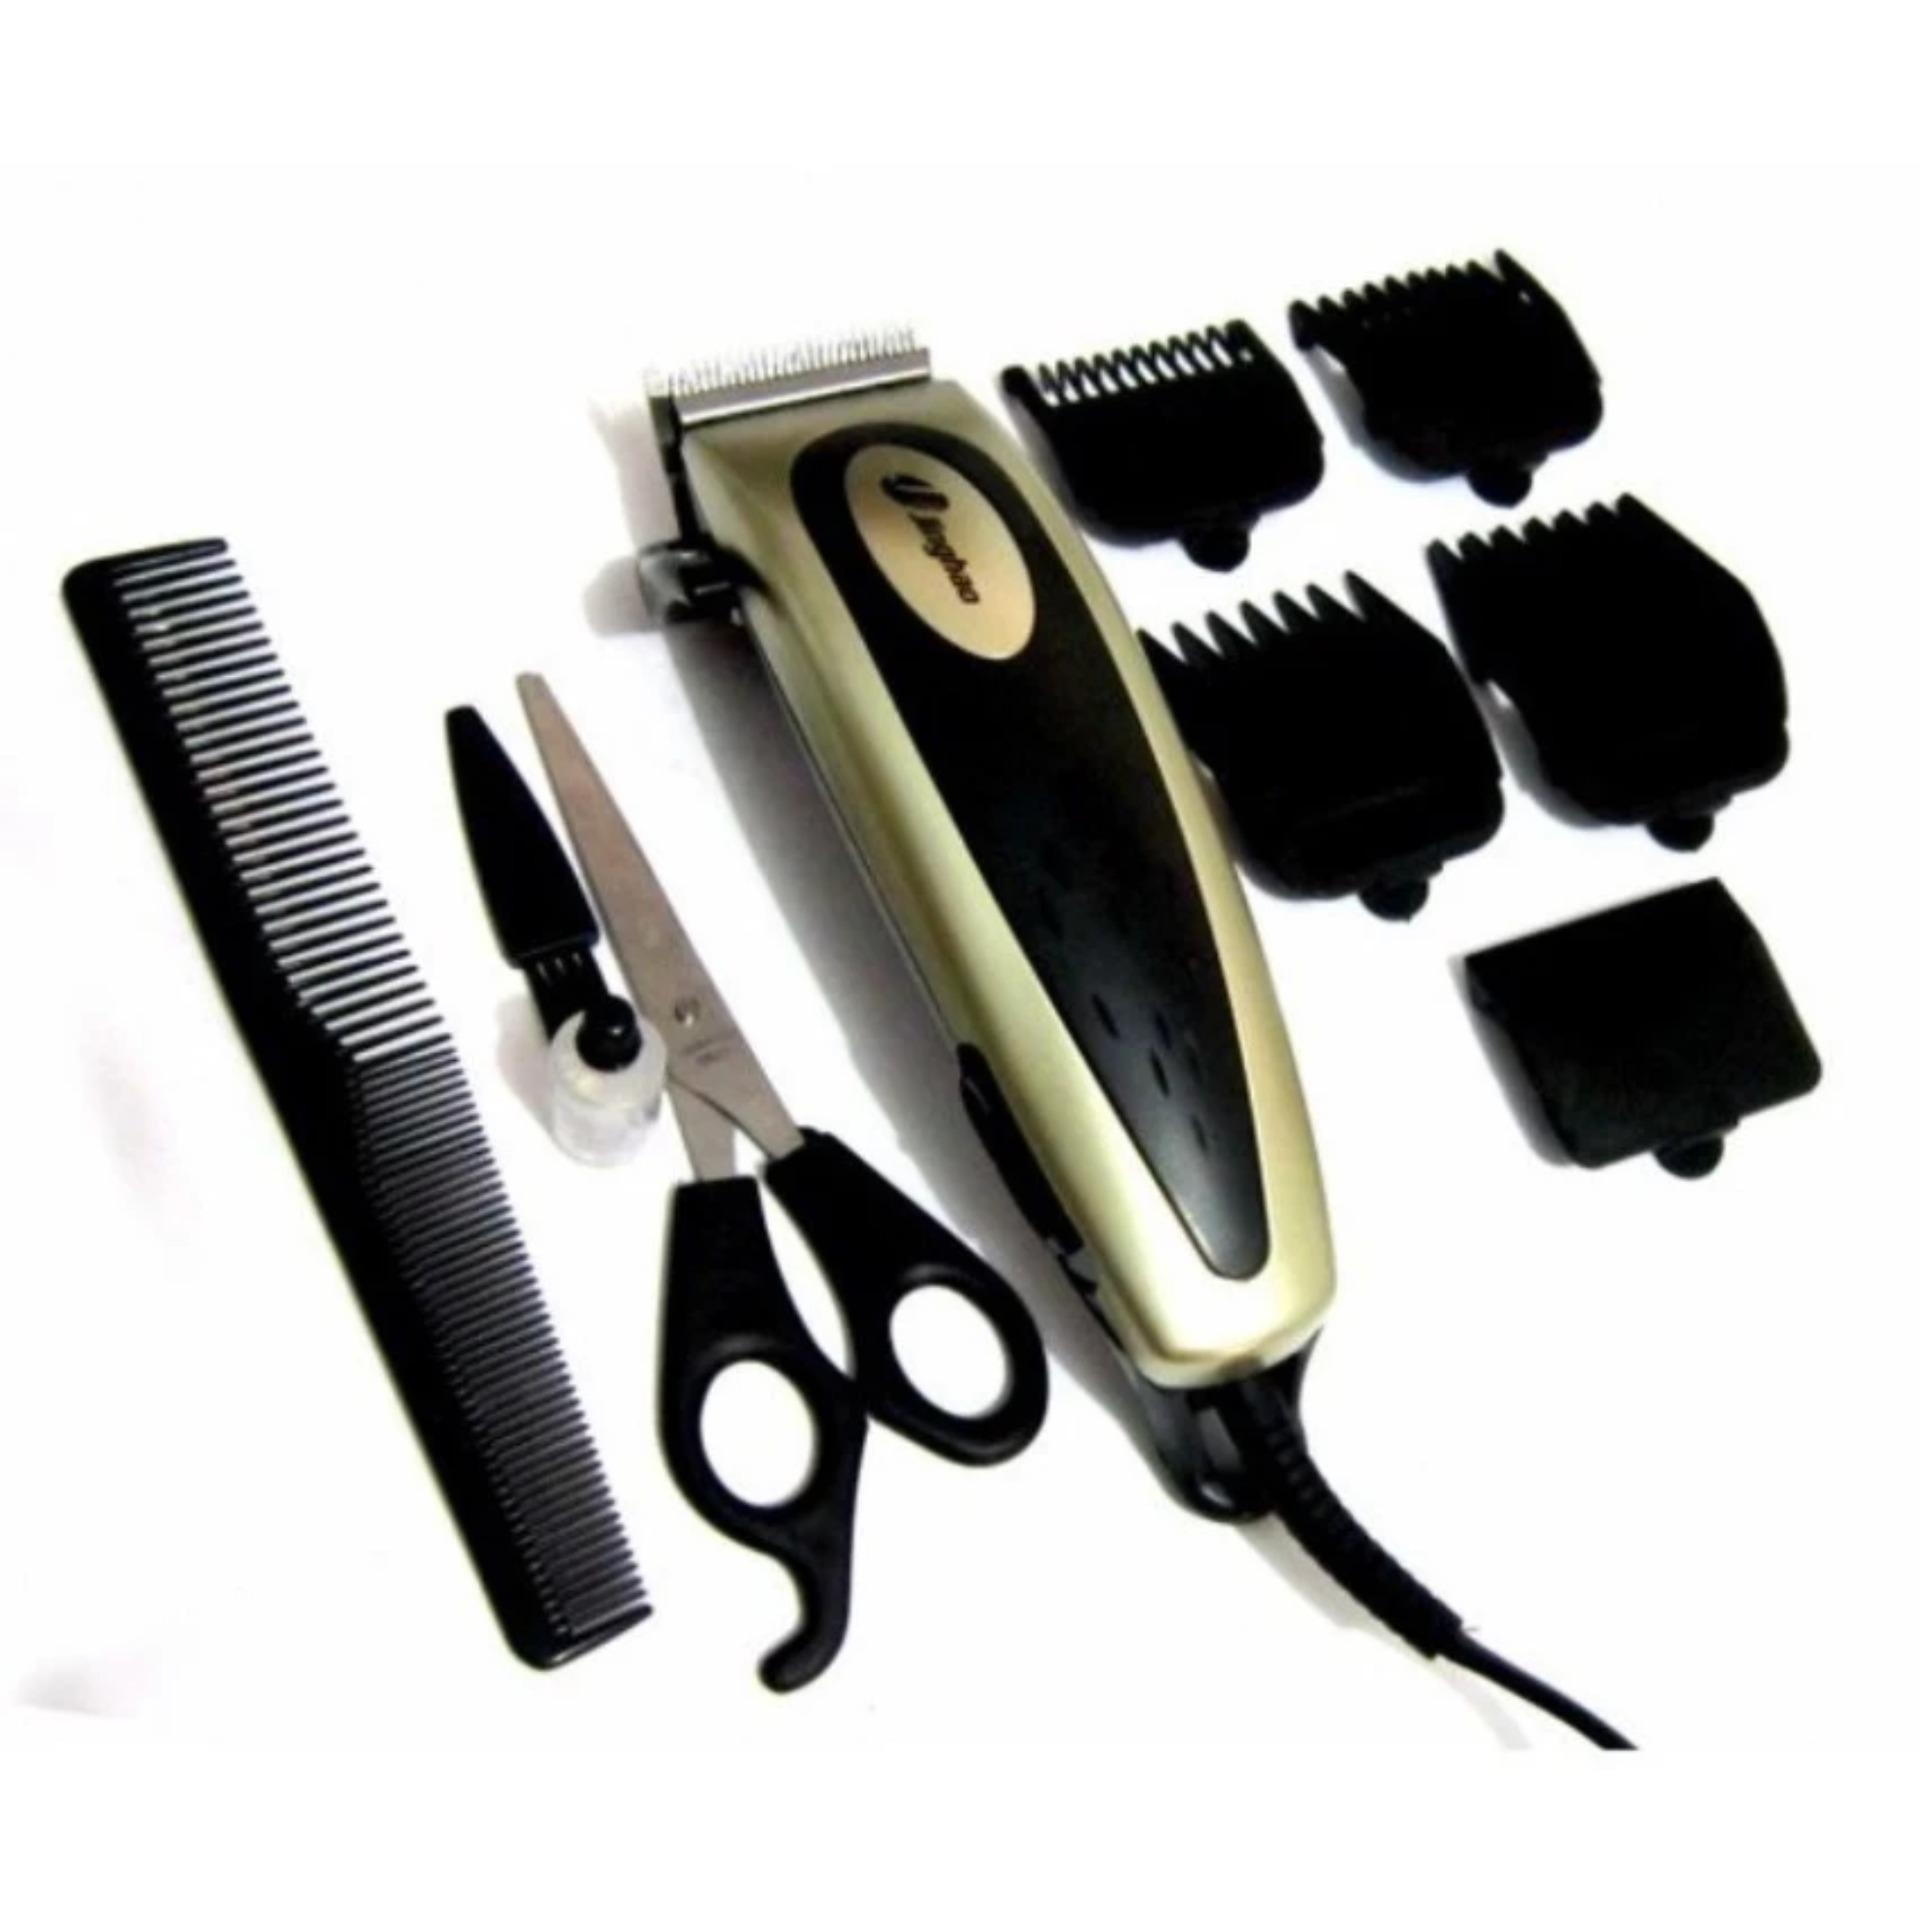 Jinghao Profesional Hair Clipper Trimmer - Mesin Potong Rambut